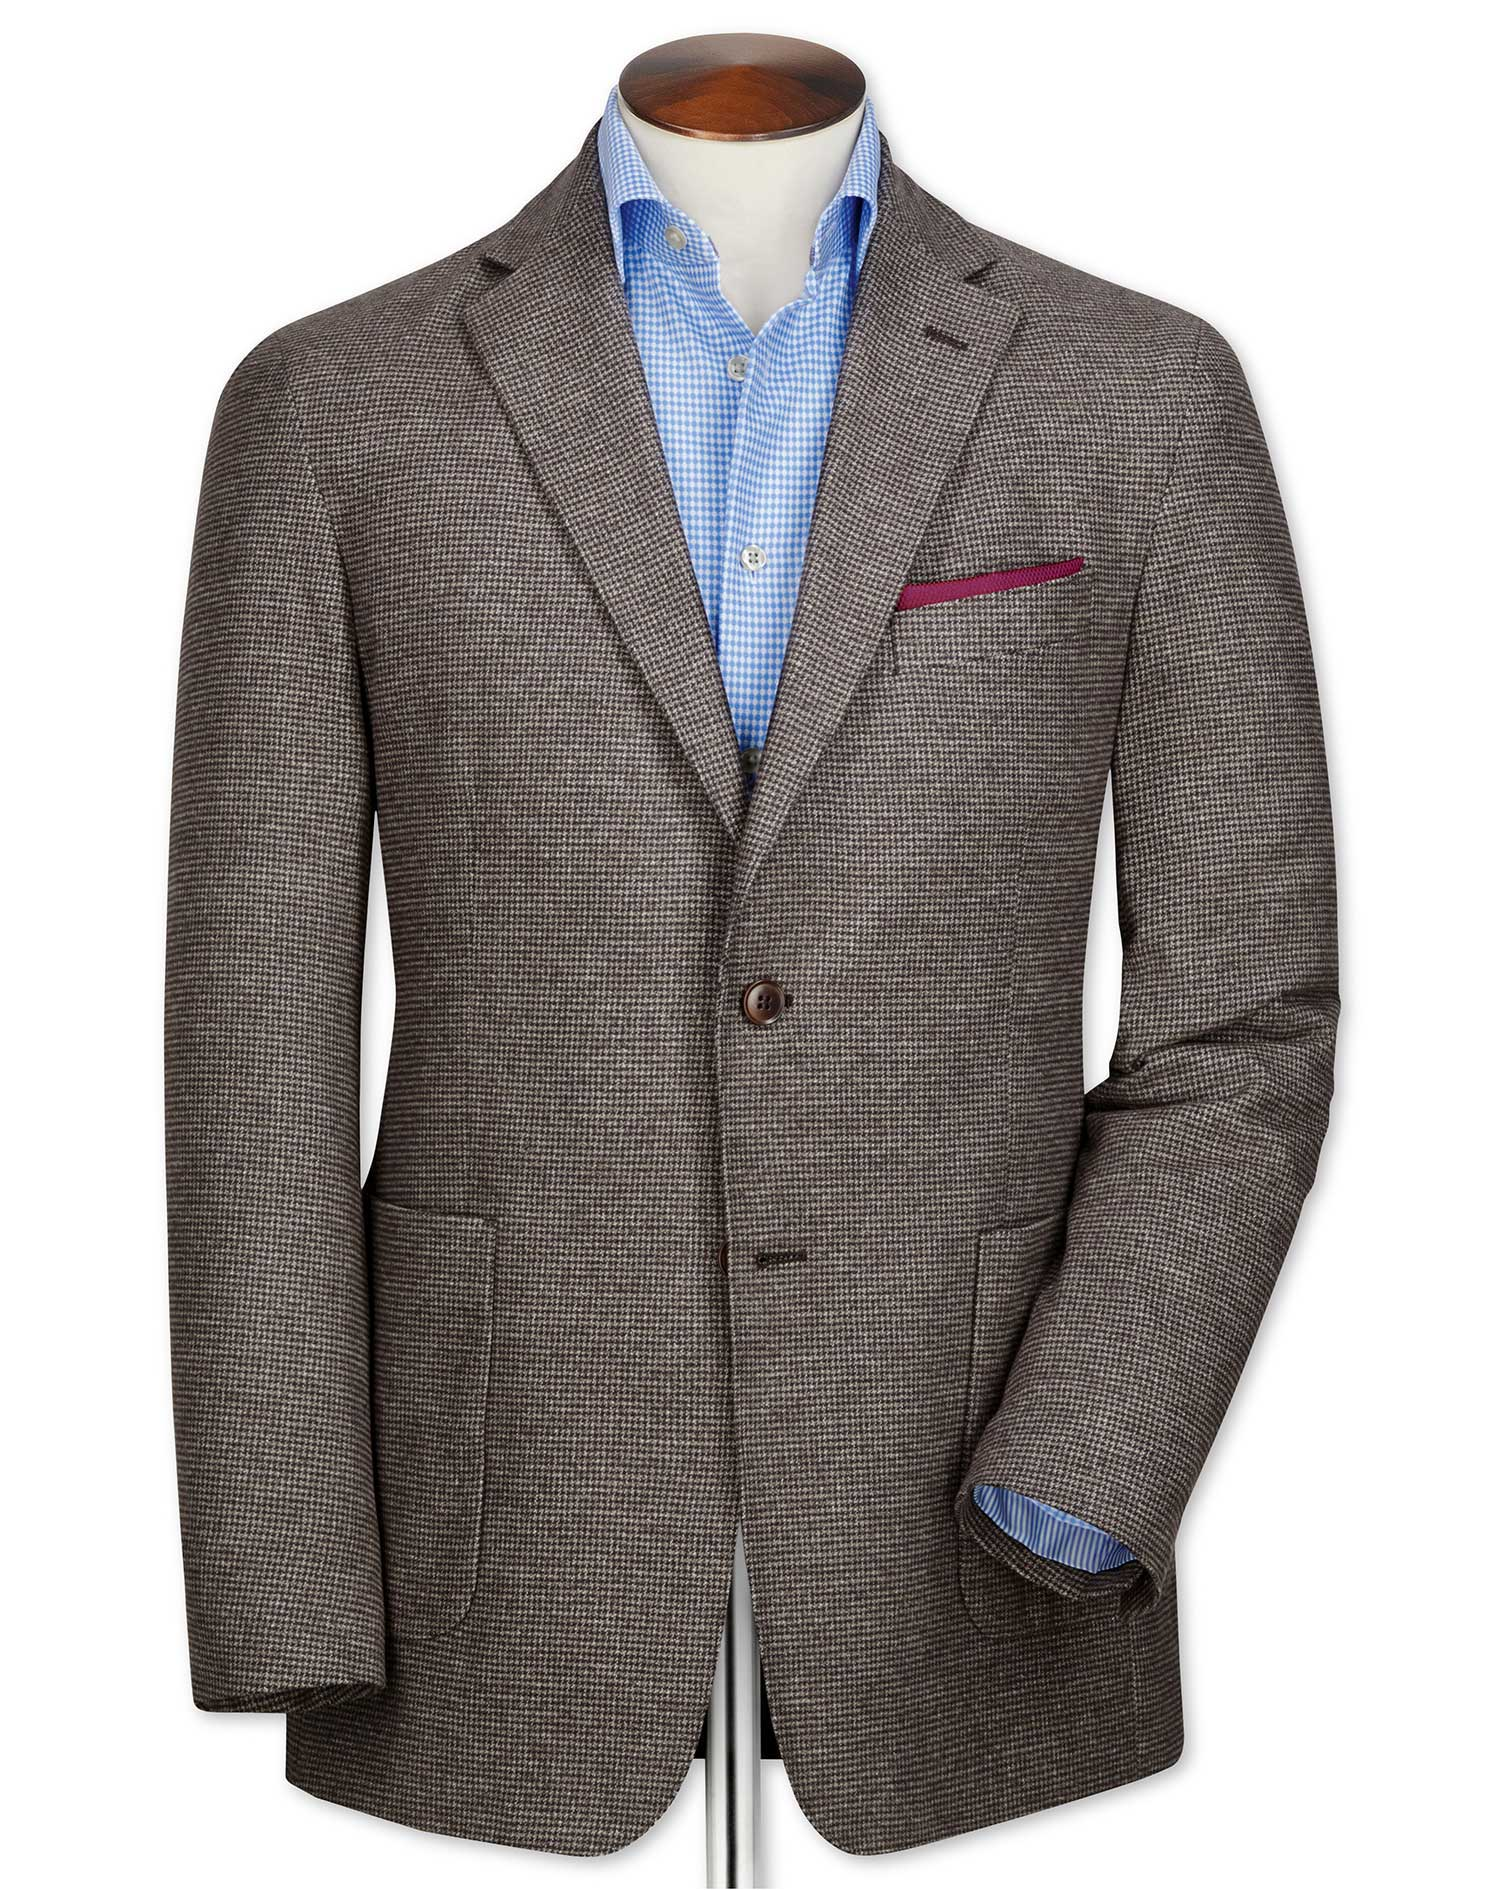 Slim Fit Brown Semi-Plain Cotton Flannel Cotton Jacket Size 42 Regular by Charles Tyrwhitt